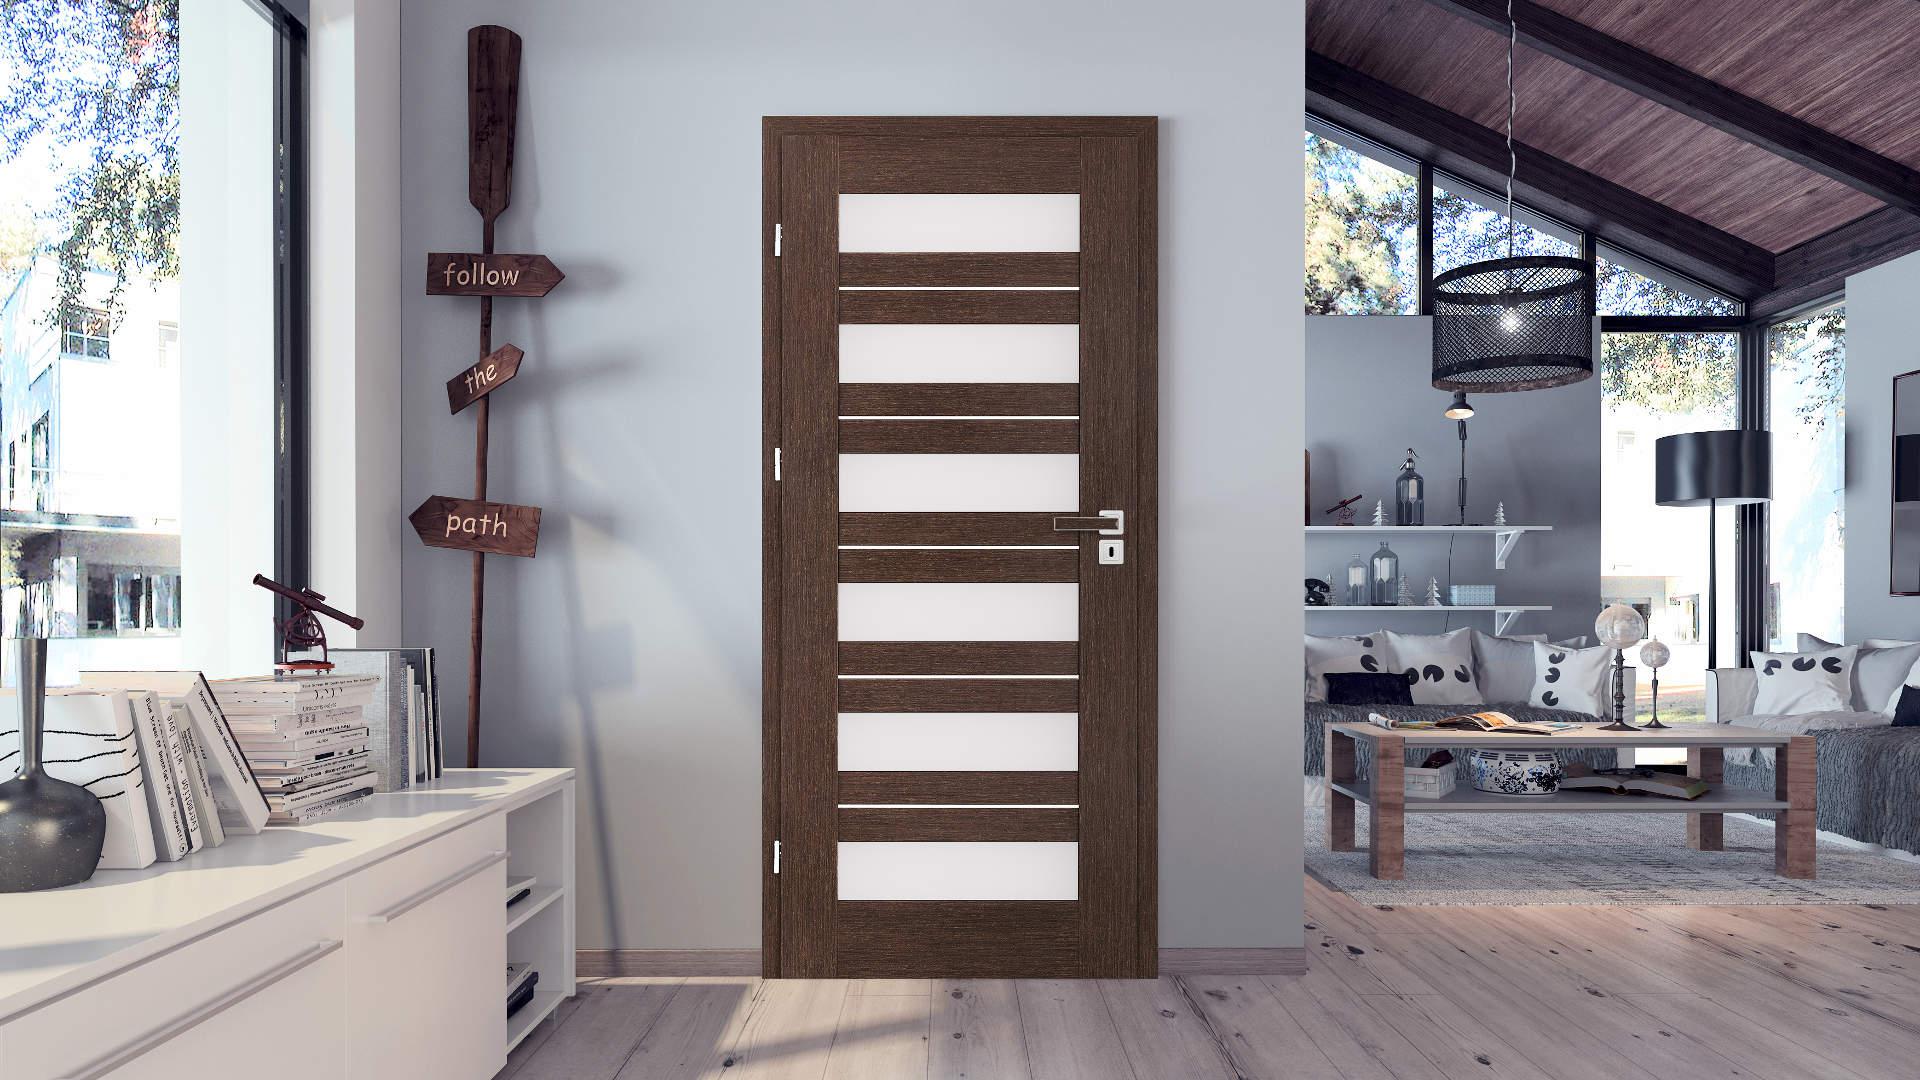 Floks ajtó, Modern beltéri ajtók